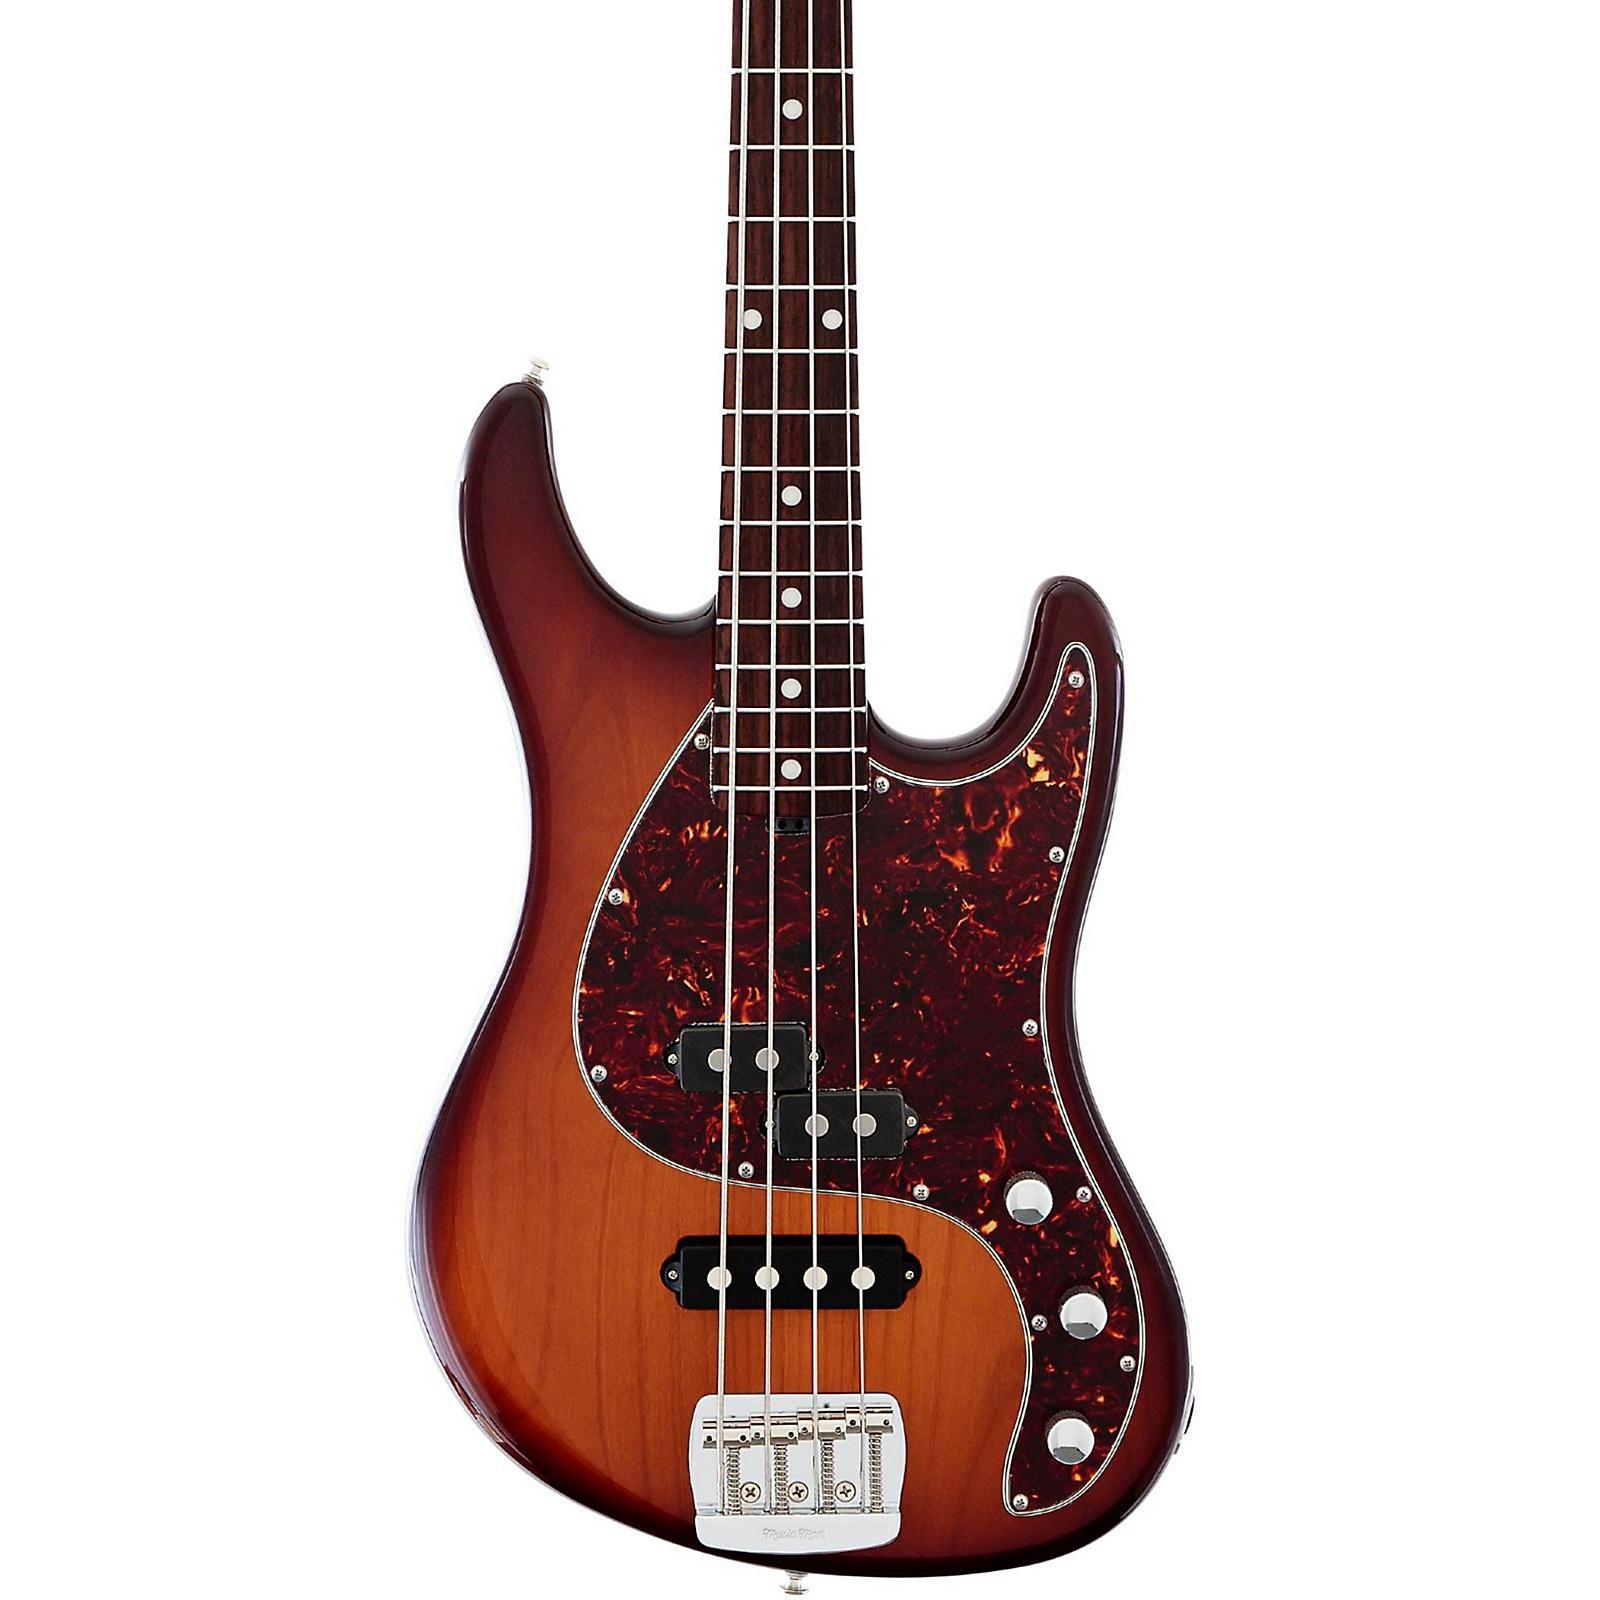 Ernie Ball Music Man Caprice Rosewood Fretboard Electric Bass